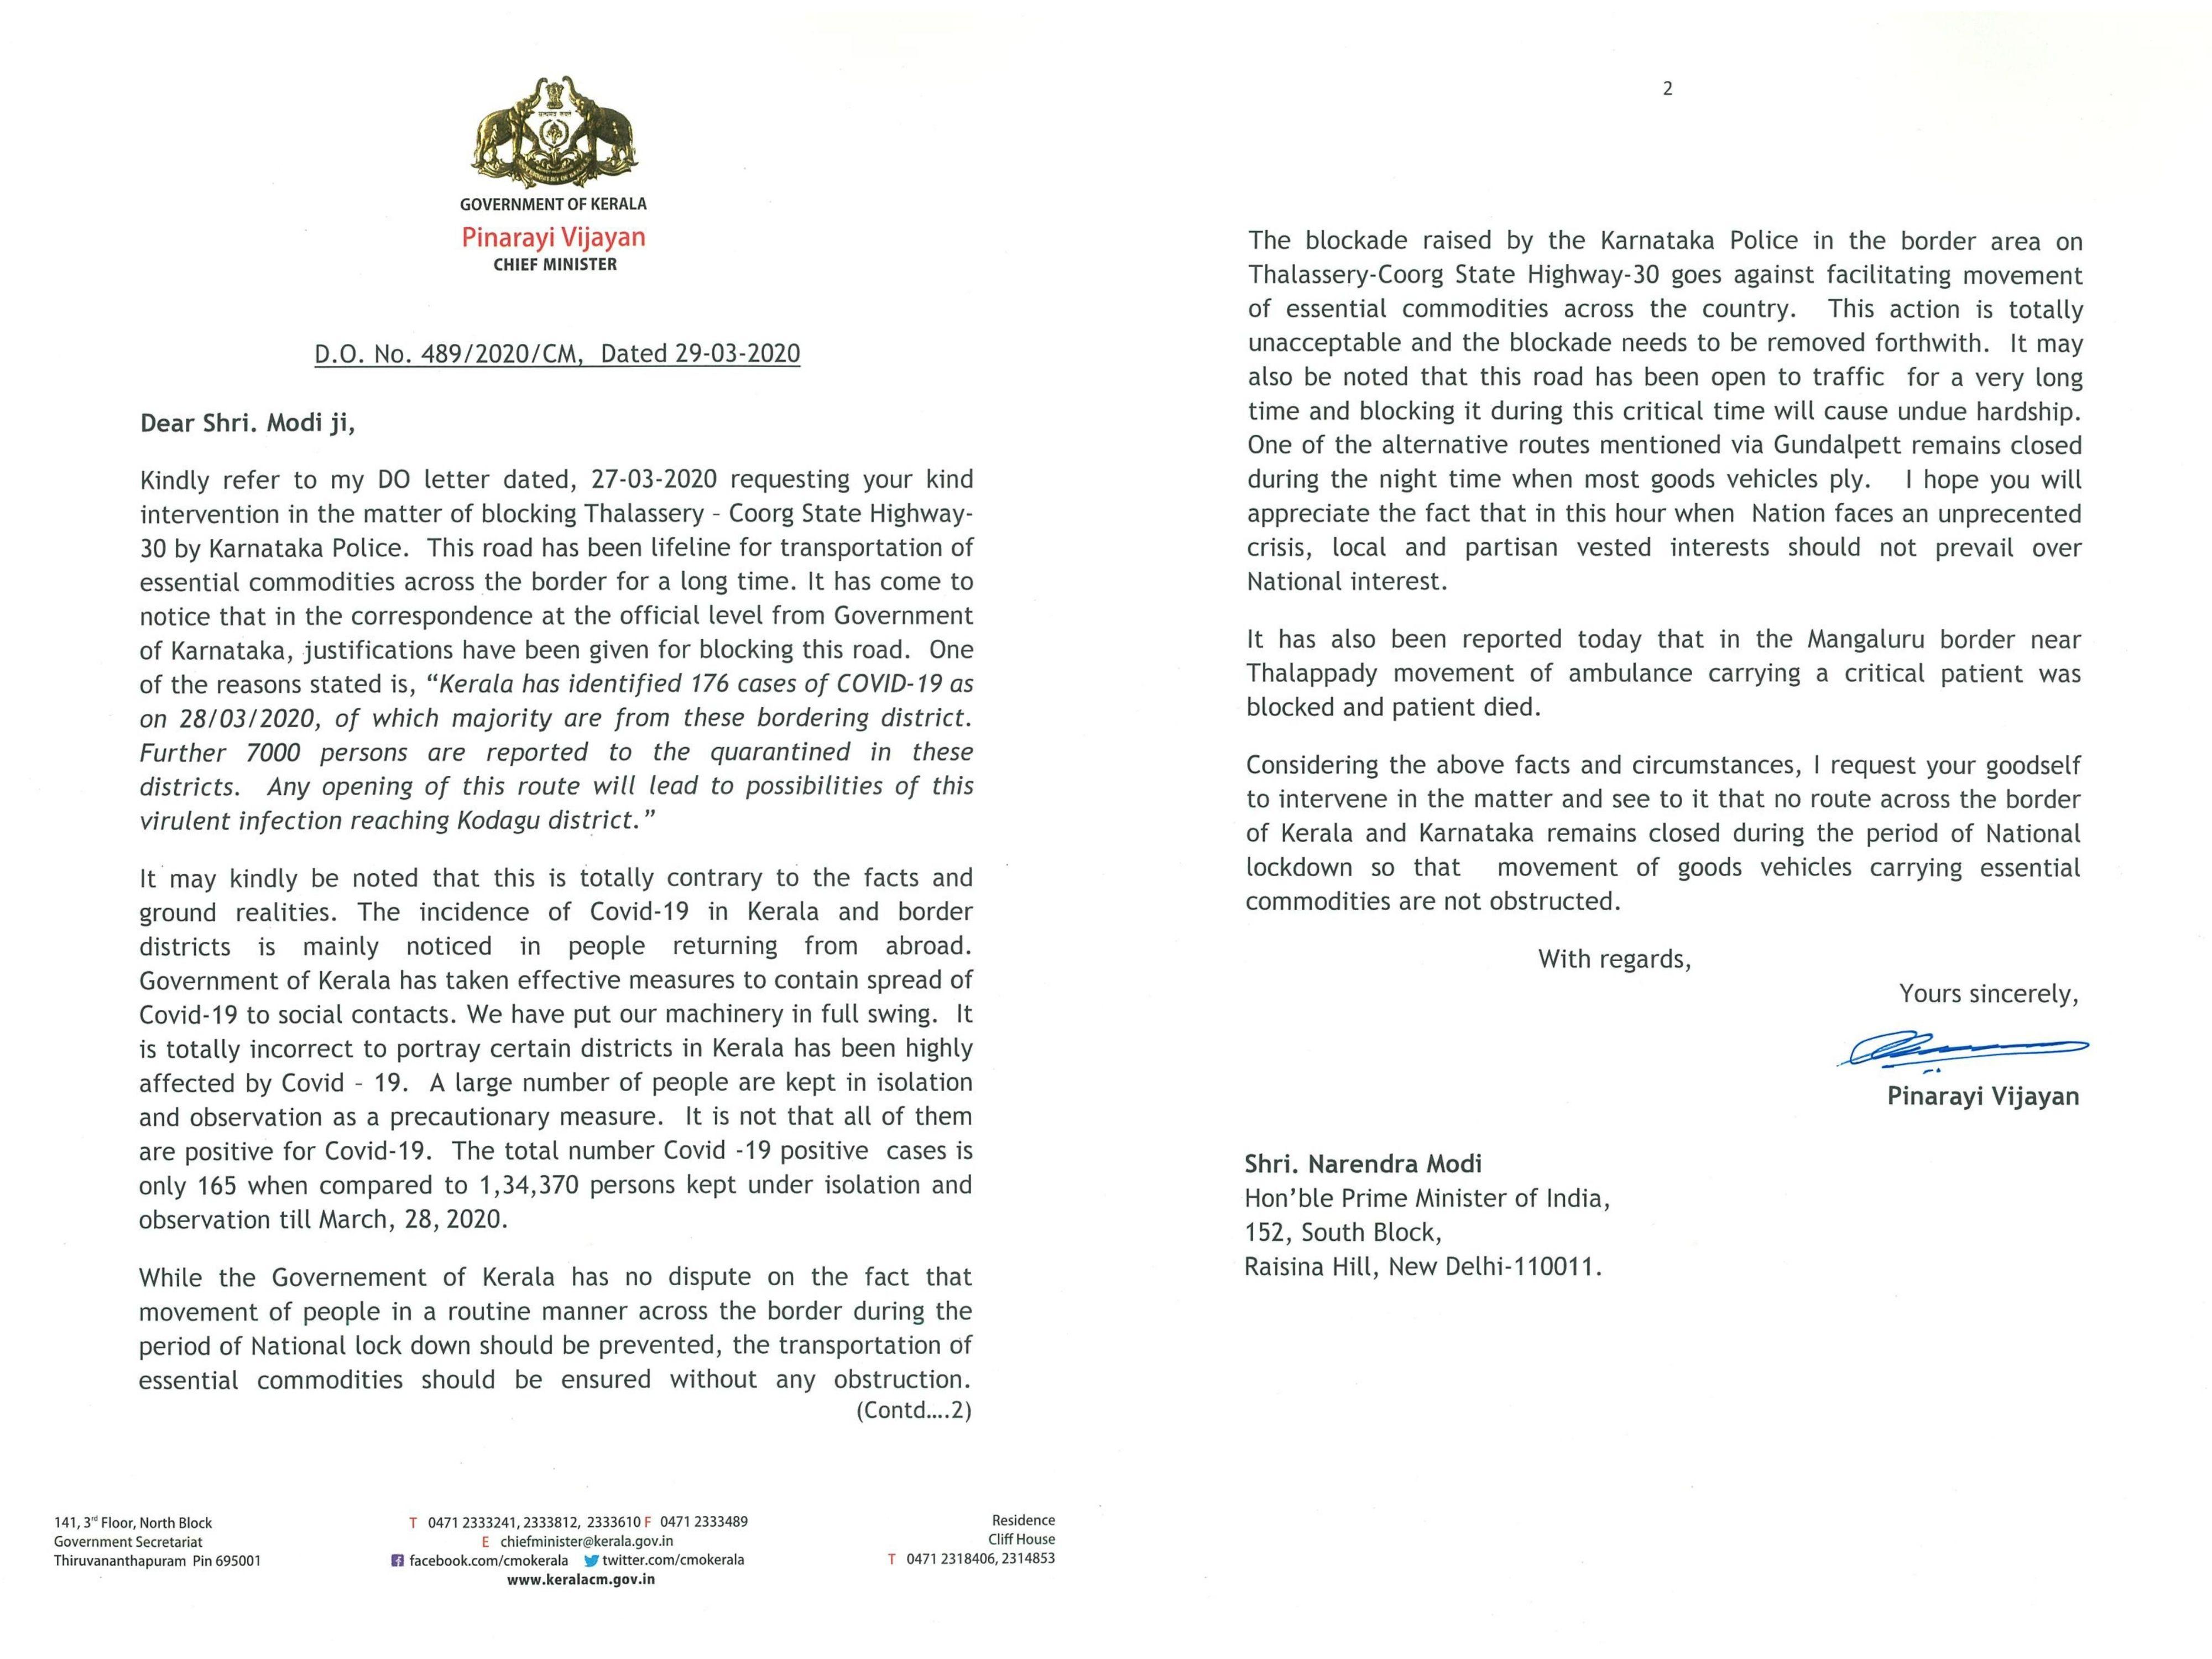 <p>Kerala CM writes to PM Modi seeking intervention over Karnataka's border sealing measures</p>